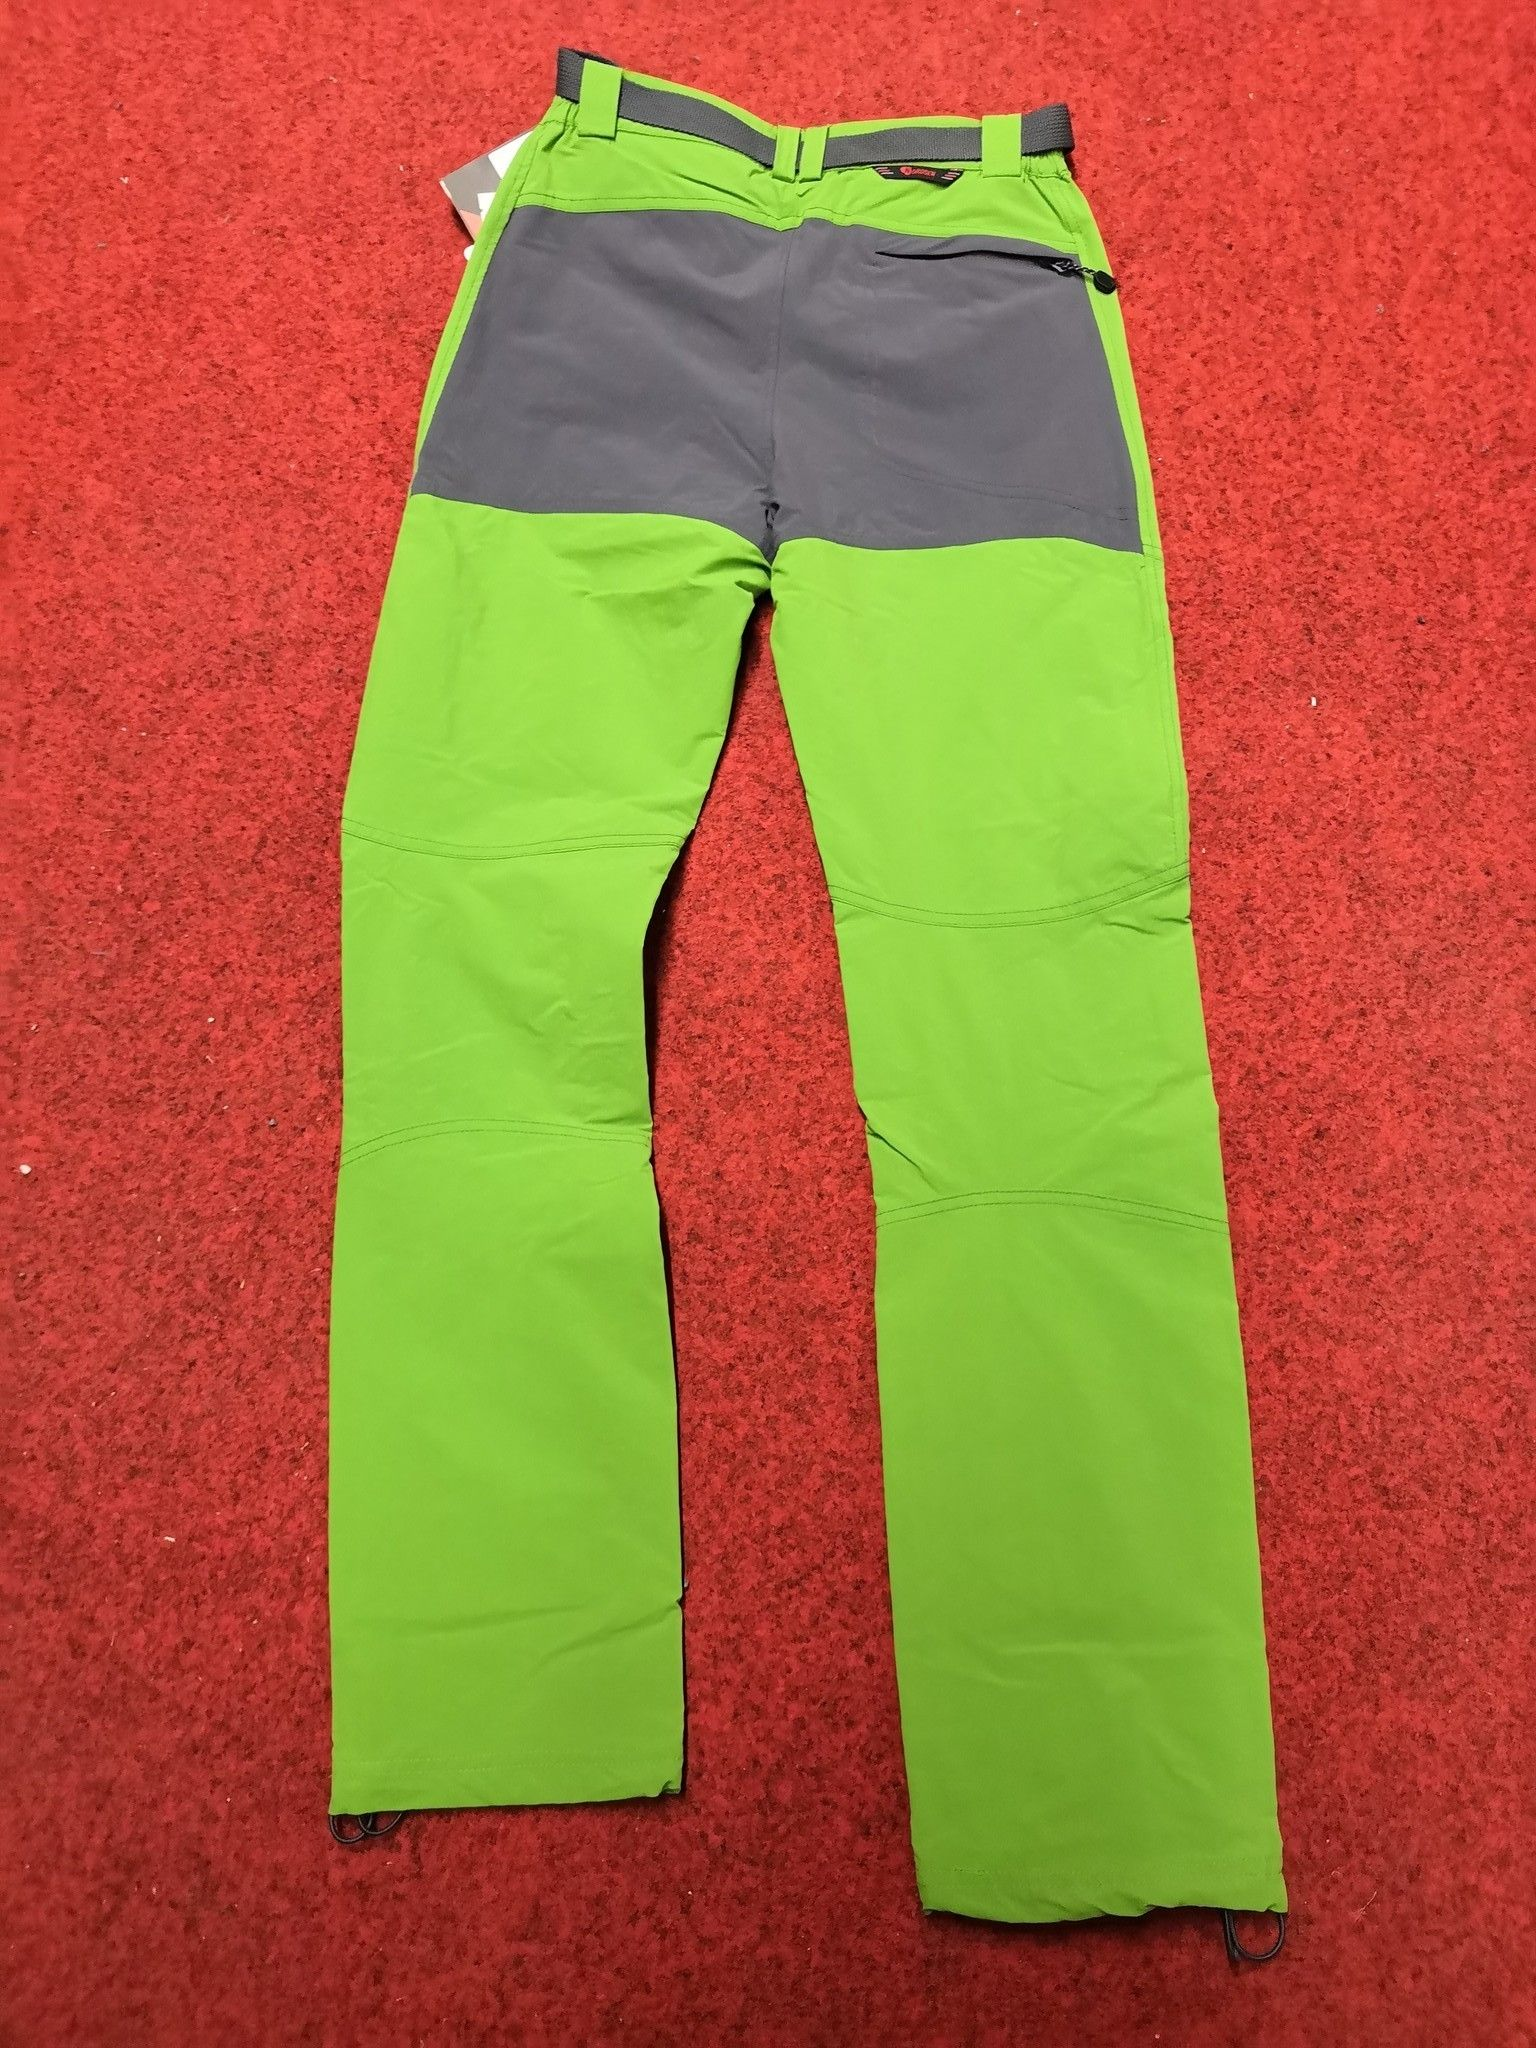 E Nordsen Abbigliamento Pantaloni Uomo Outdoor Accessori Erashop eIWEDHY29